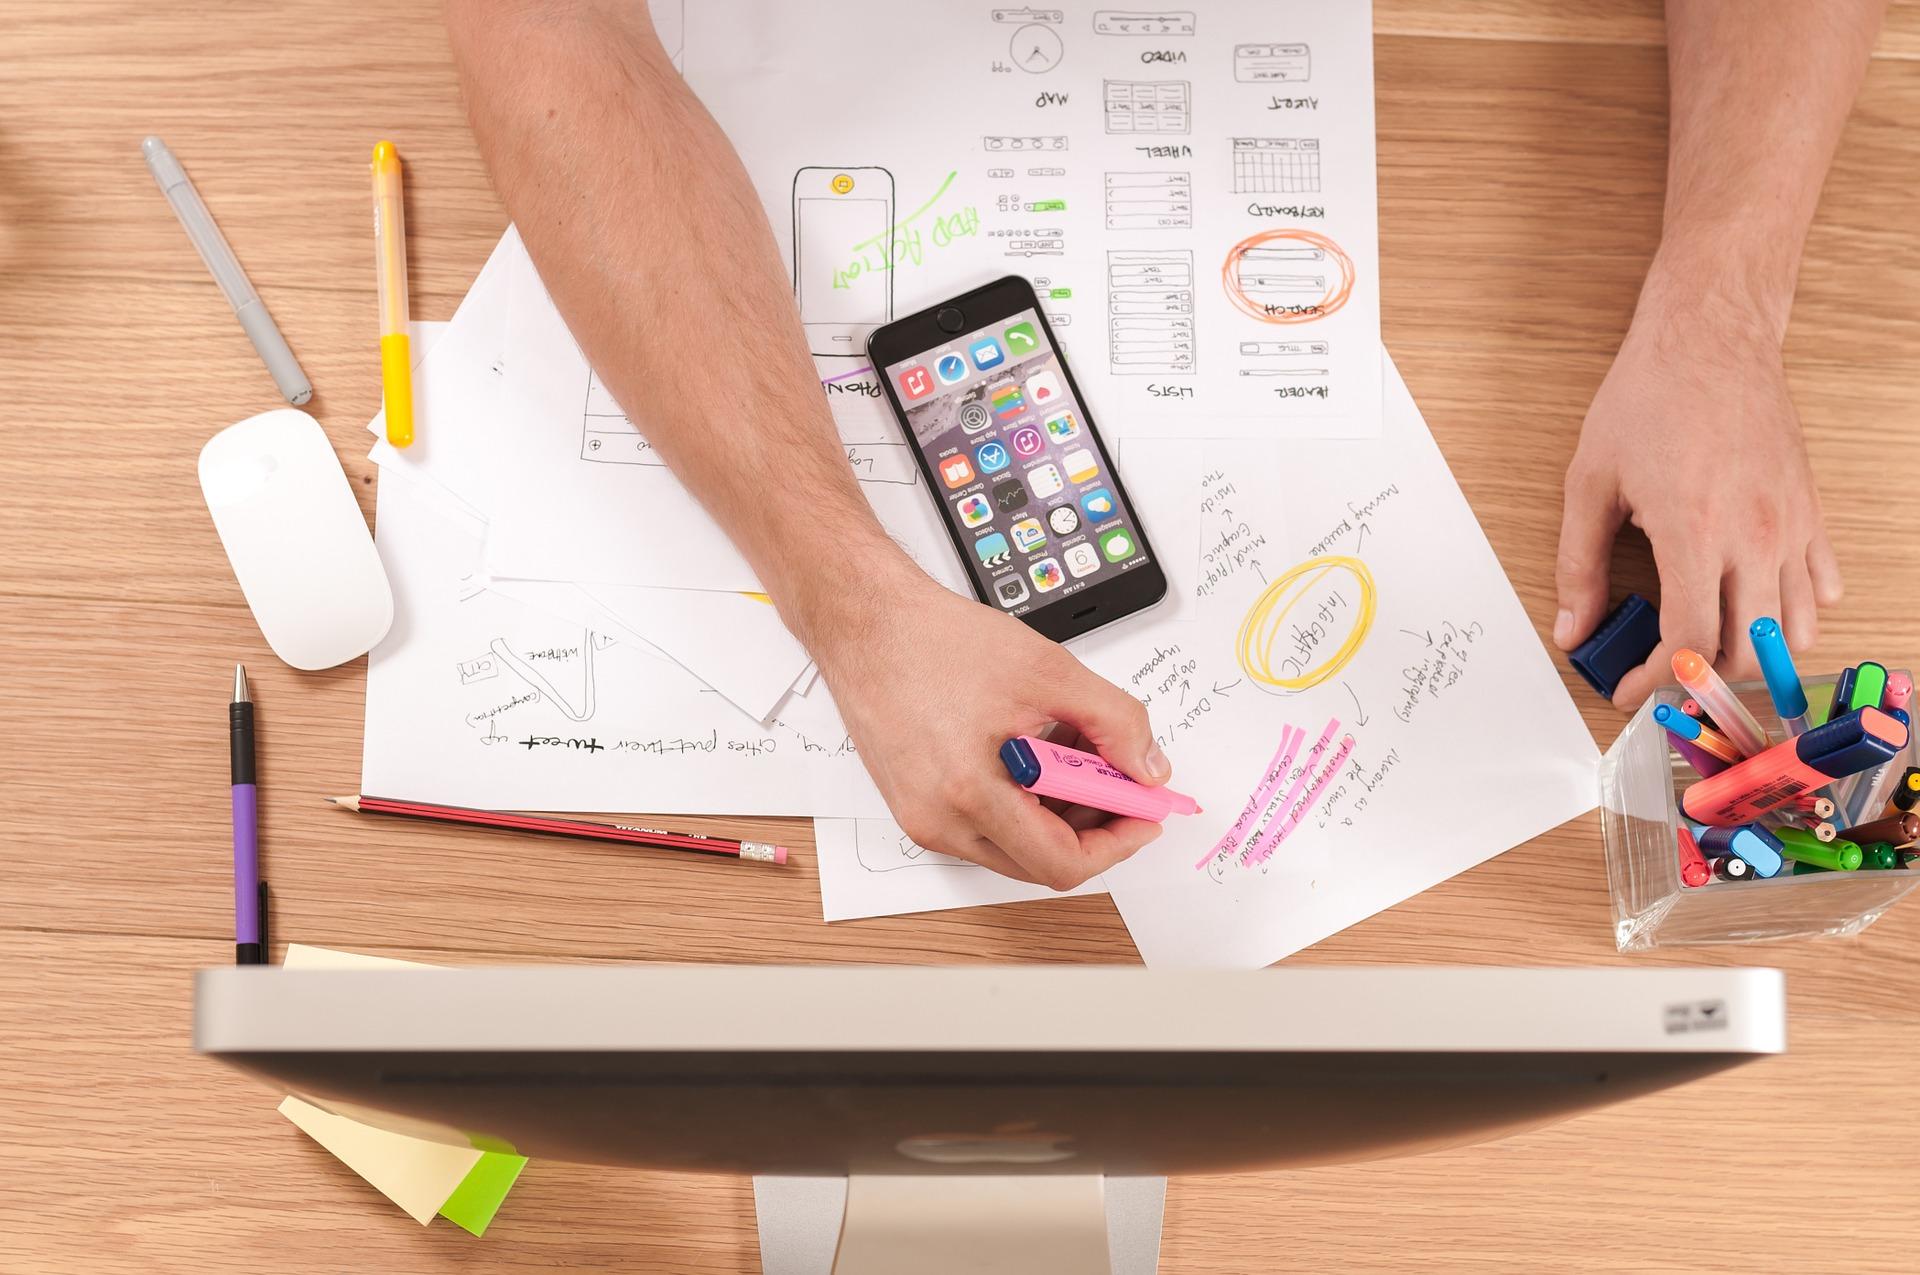 Meet Your MarTech Goals with Effective Project Management